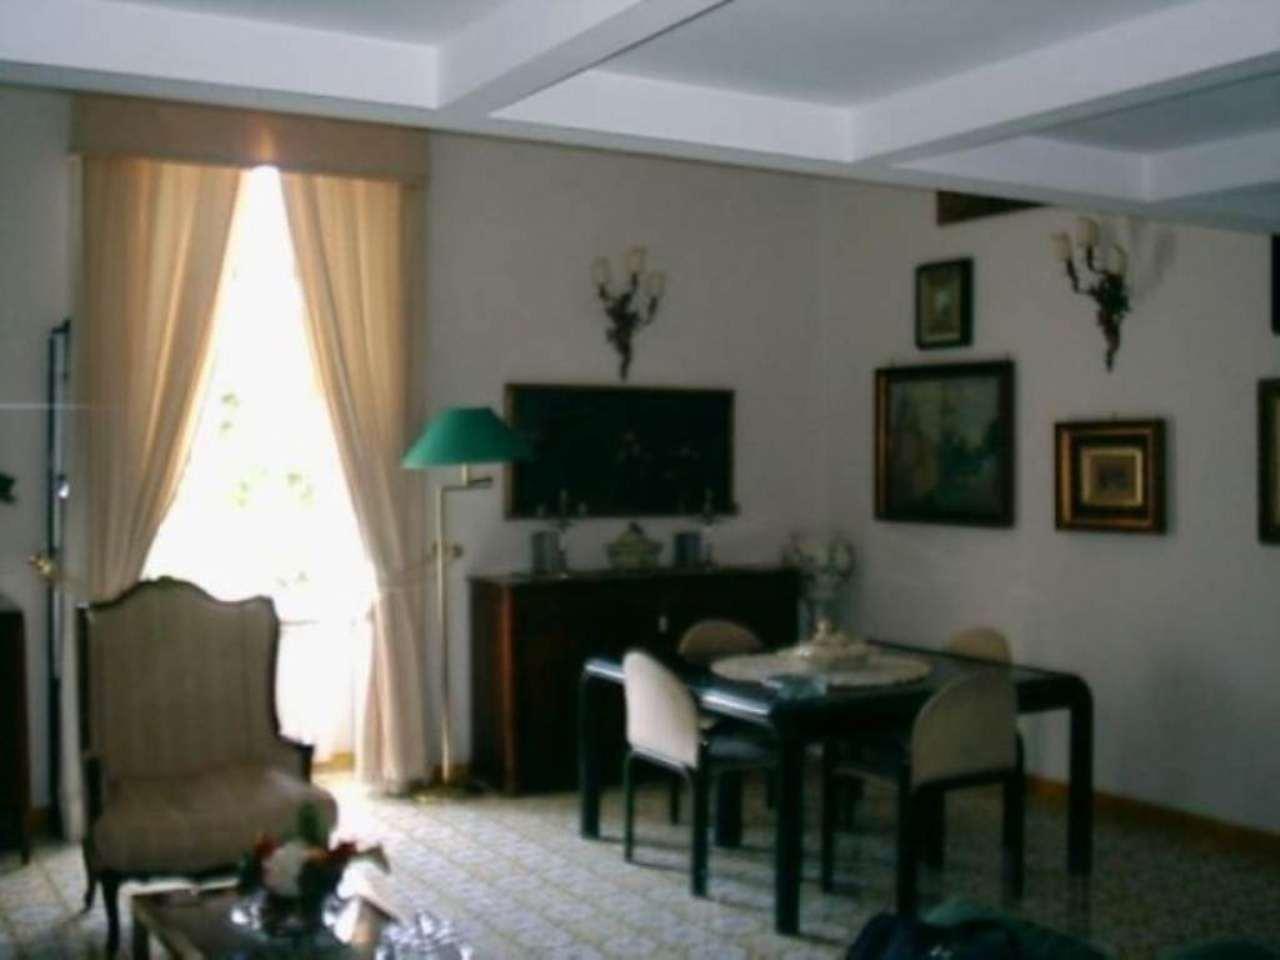 Appartamento con giardino privato a napoli pag 2 - Casa con giardino napoli ...